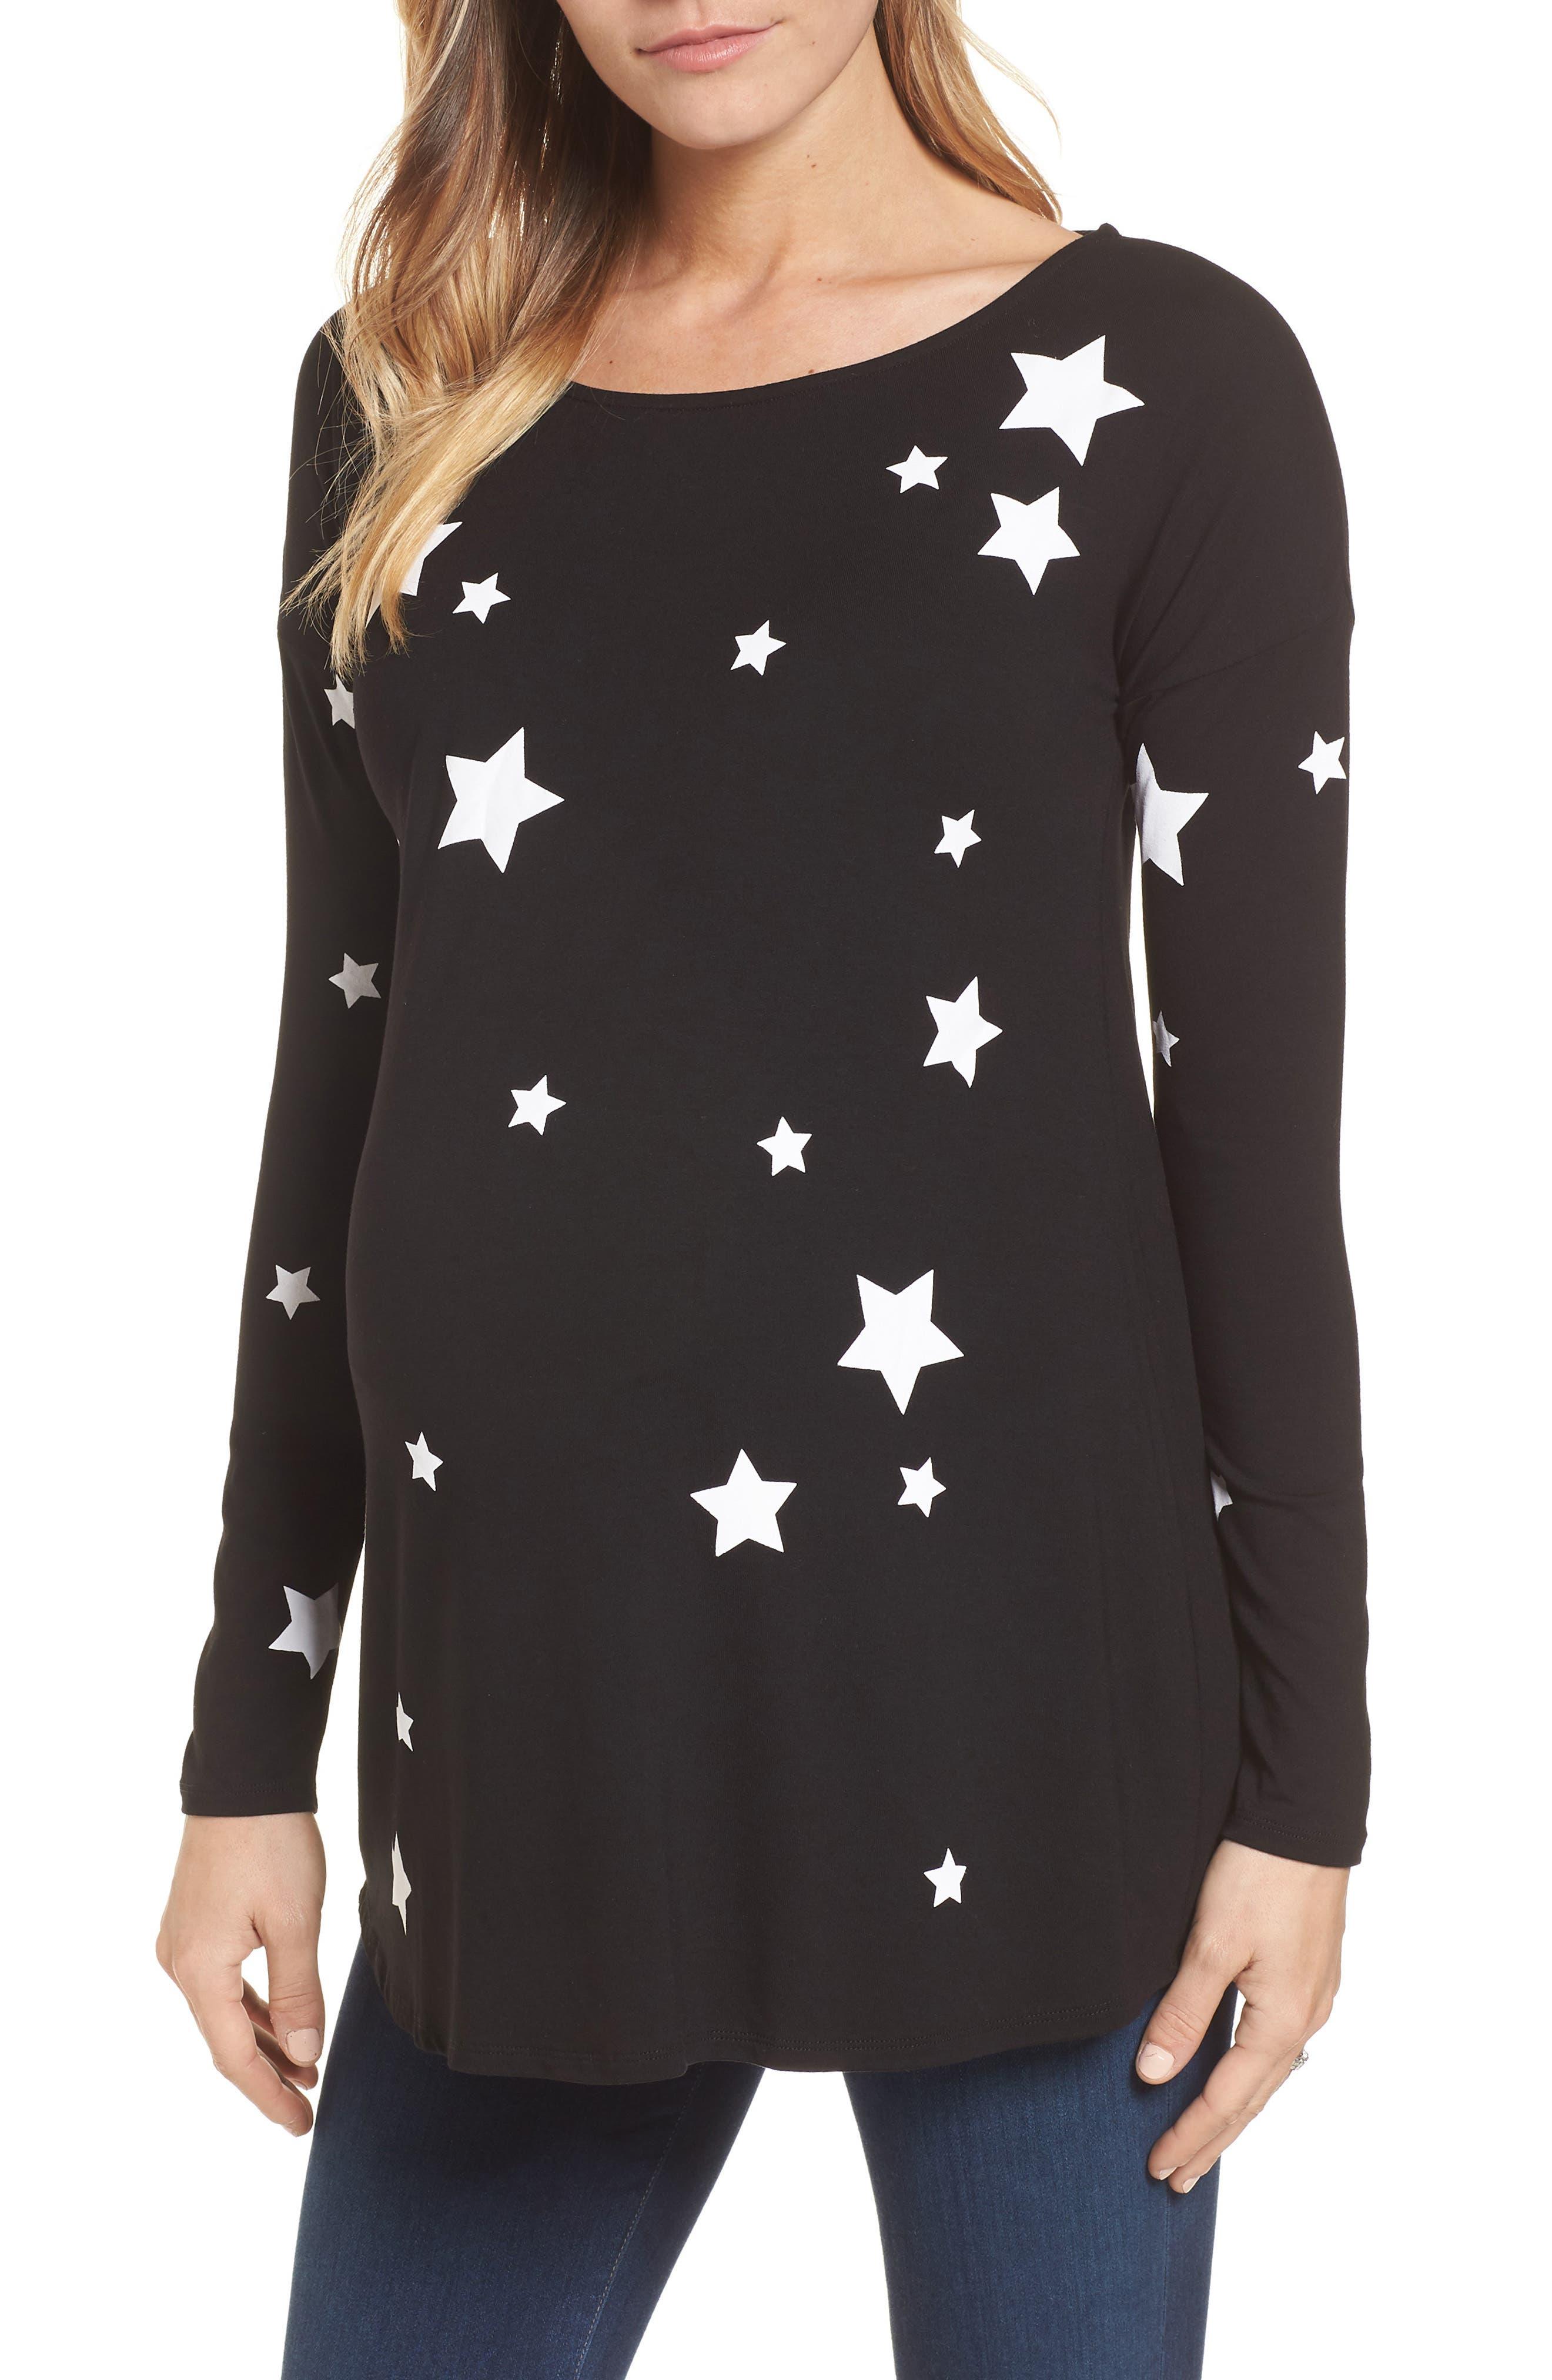 Rosie Maternity Tee,                         Main,                         color, Black/White Stars